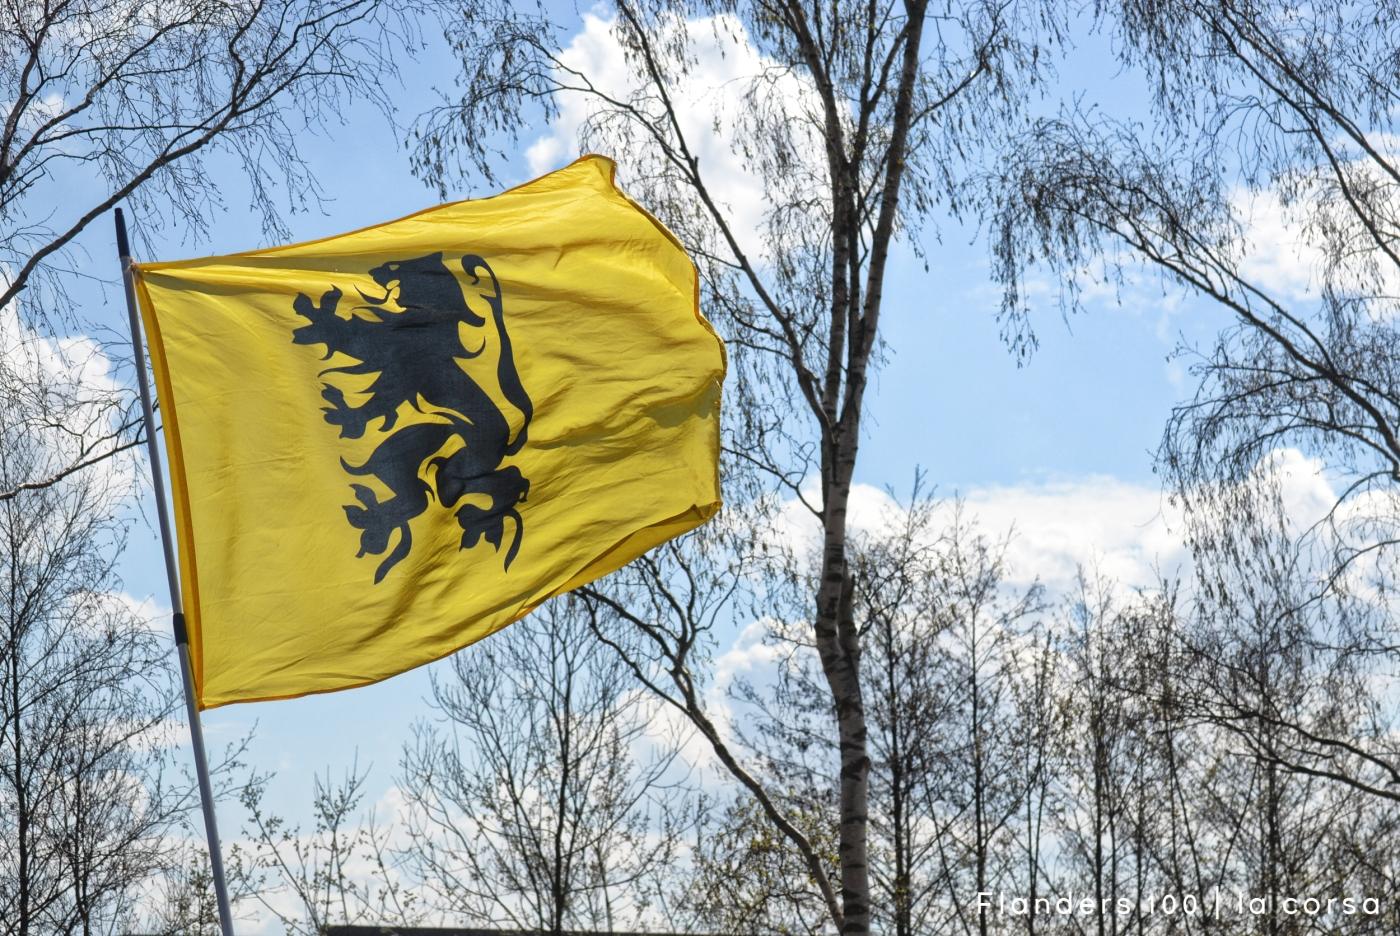 Flanders 100 | la corsa